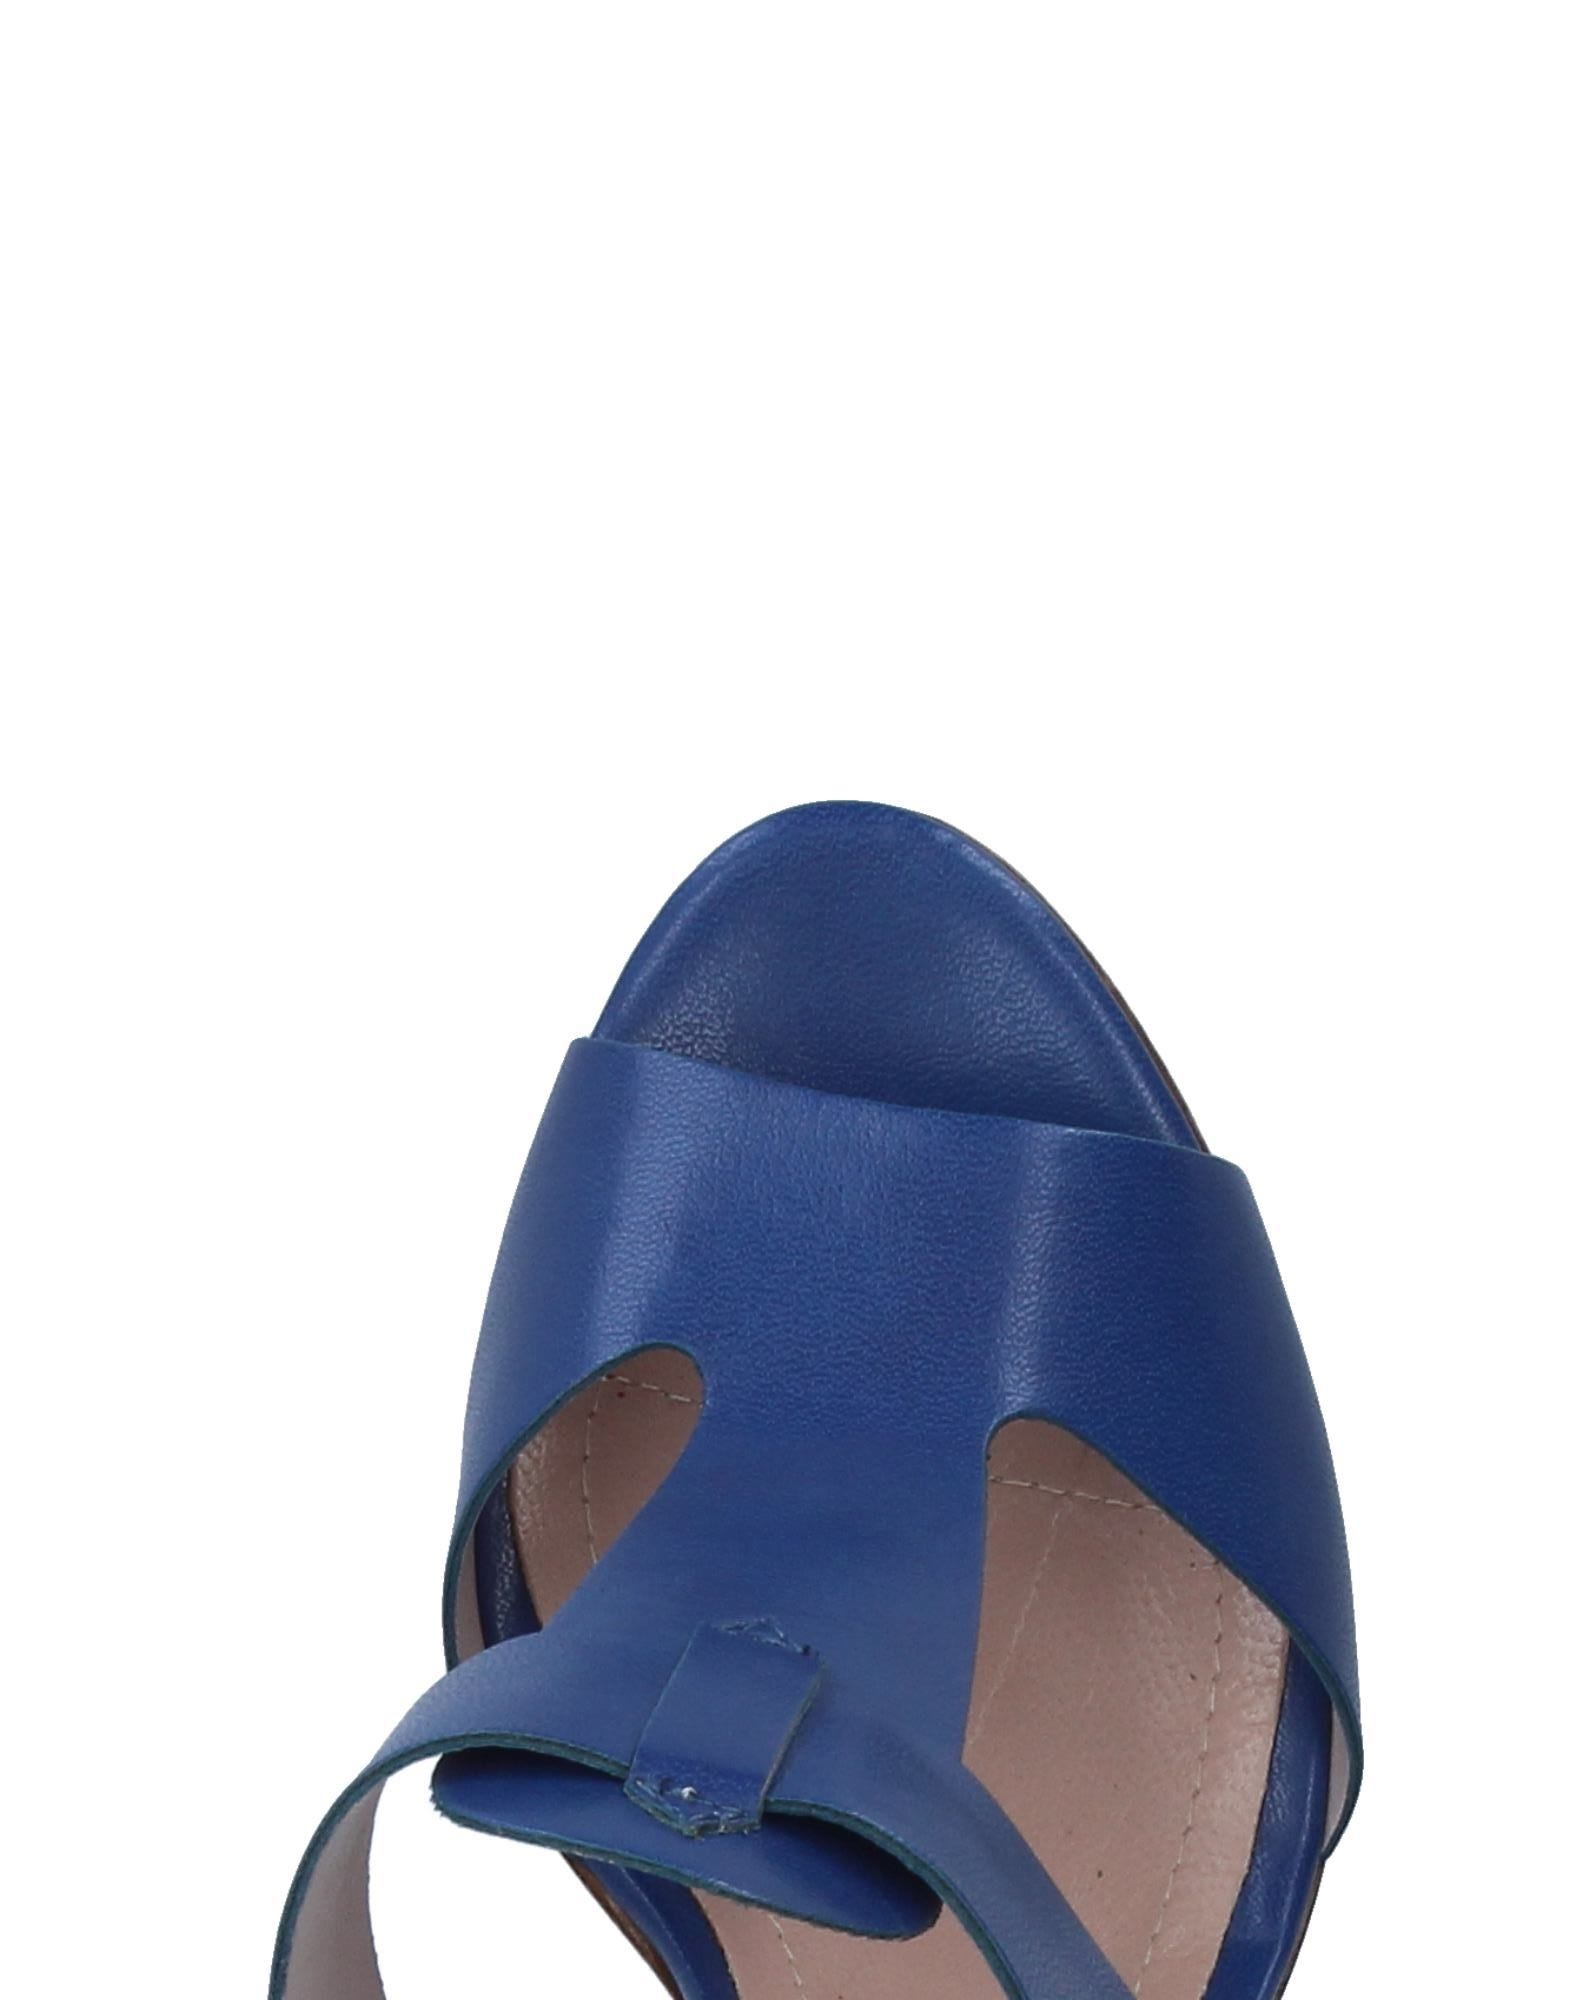 lorenzo lorenzo lorenzo mari sandales - femmes lorenzo mari sandales en ligne le royaume - uni - 11367107ej f86390